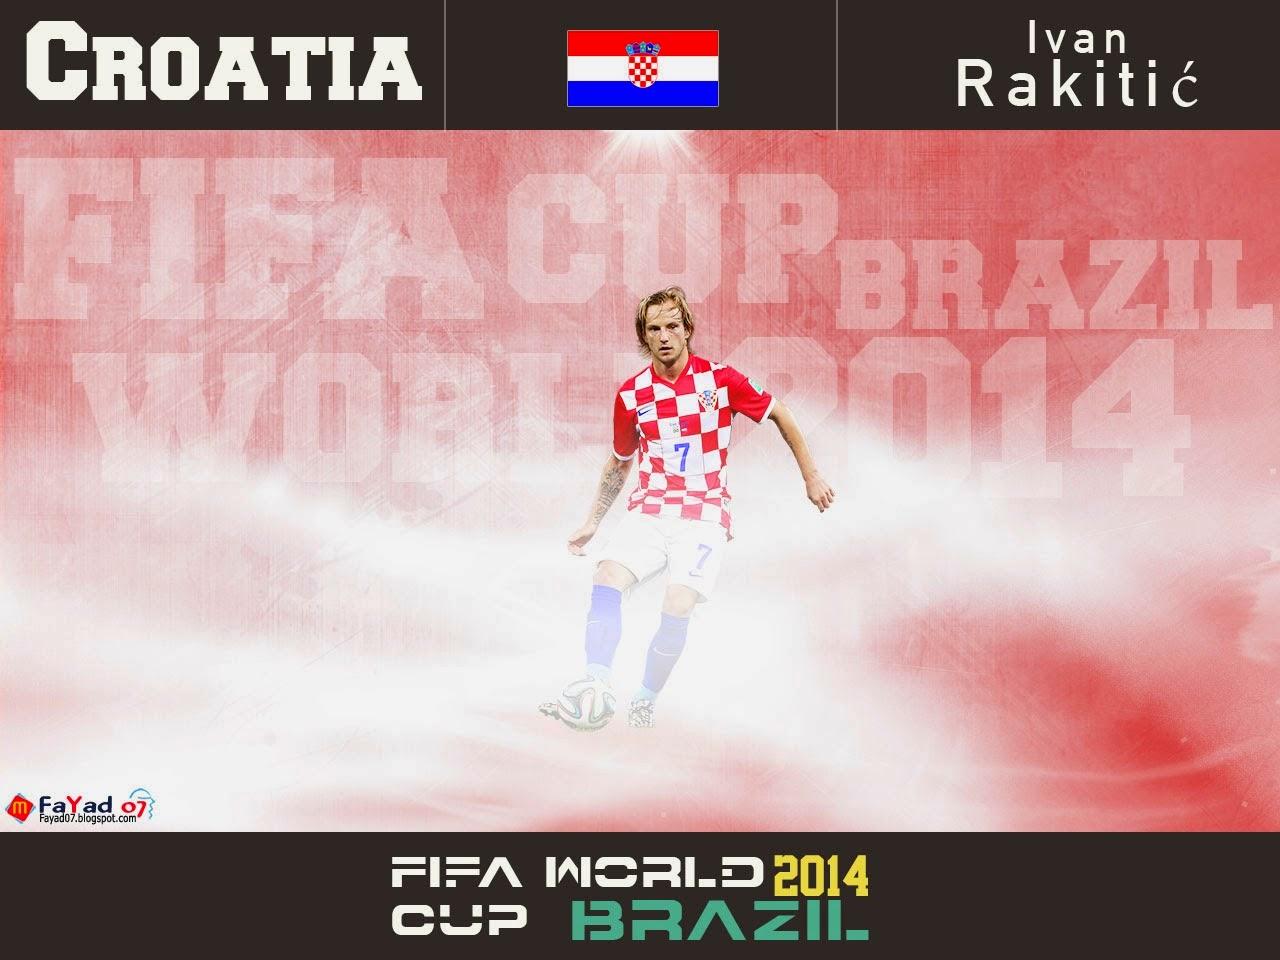 Hd Football Wallpapers Ivan Rakitic Wallpapers